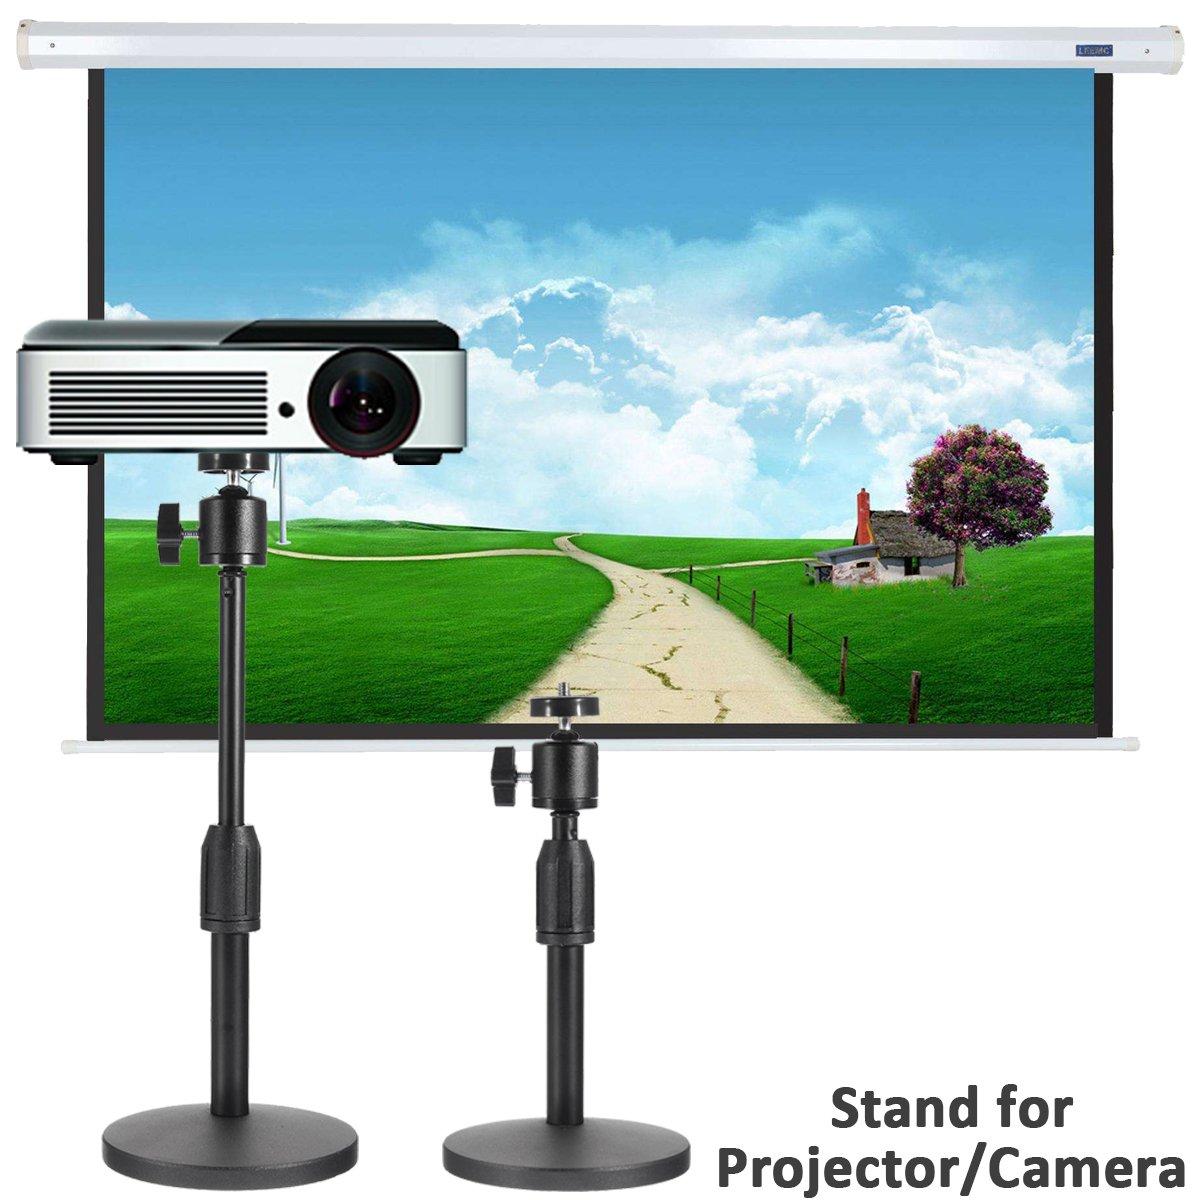 Desktop Laptop Projector Stand Holder Swivel Head Tripod Mount Adjustable Height by Ologymart (Image #8)